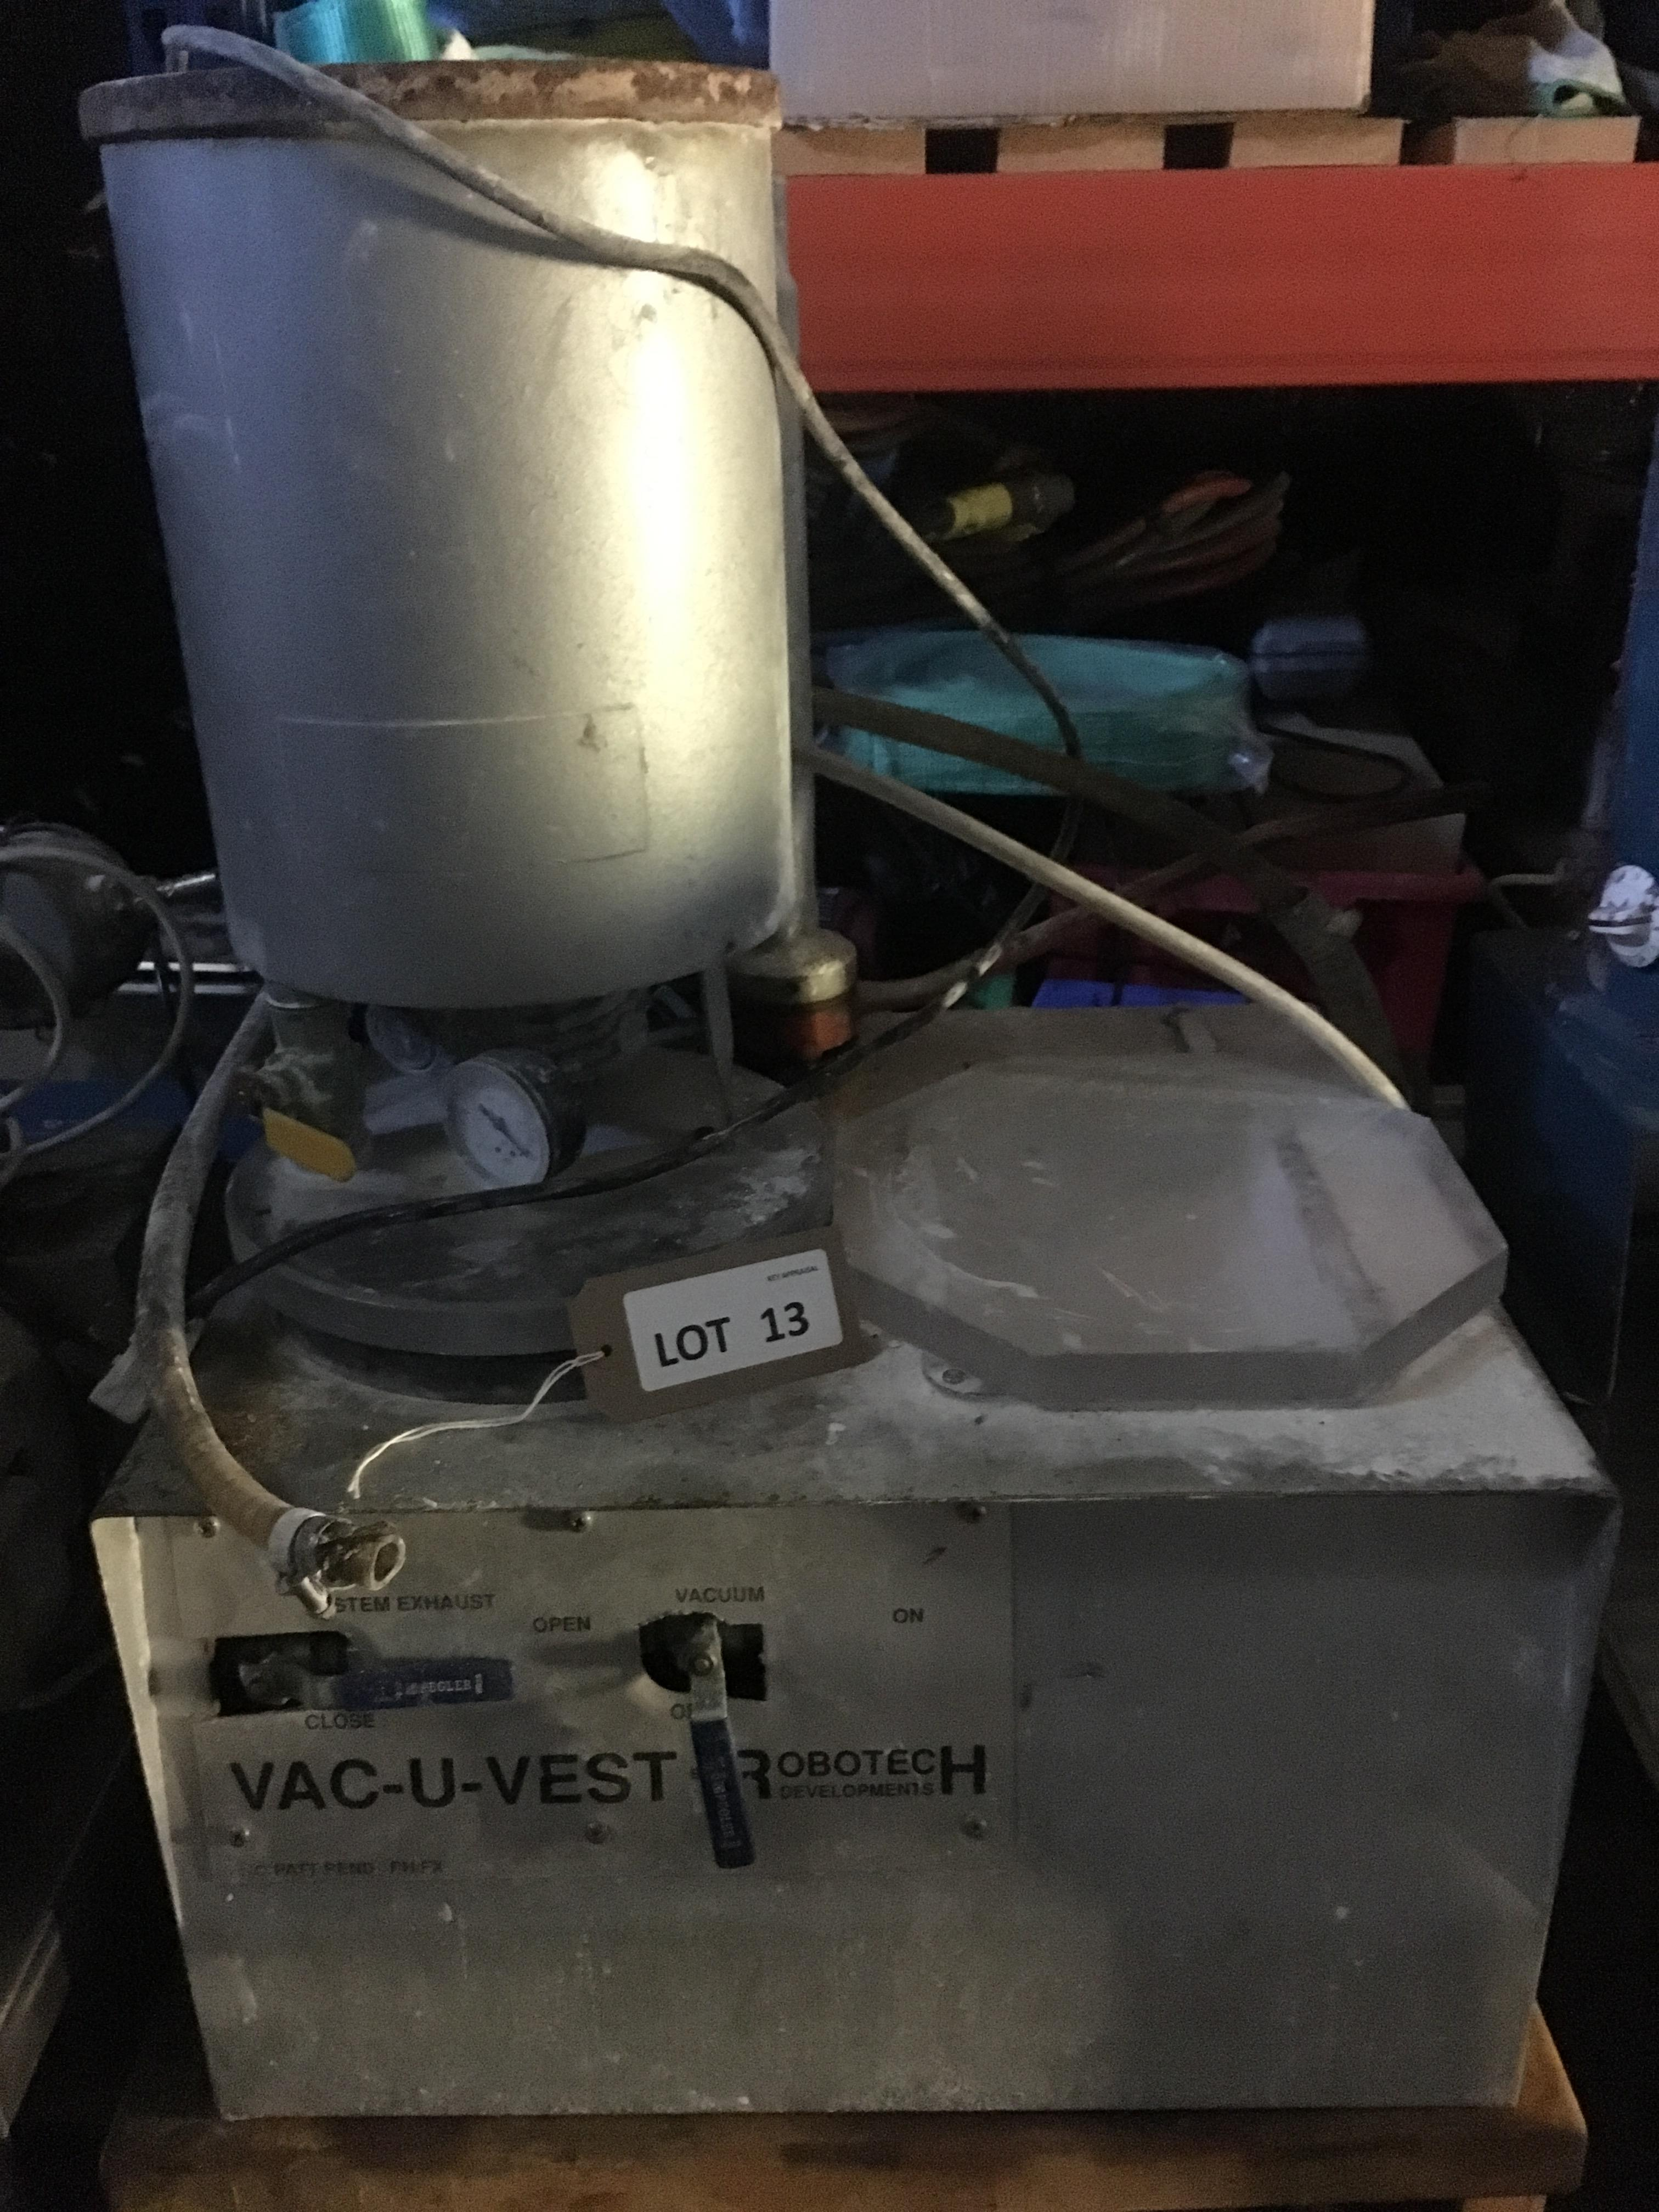 Los 13 - Robotech Vac-U-Vest platinum investing machine, serial no: not accessible, with vacuum pump